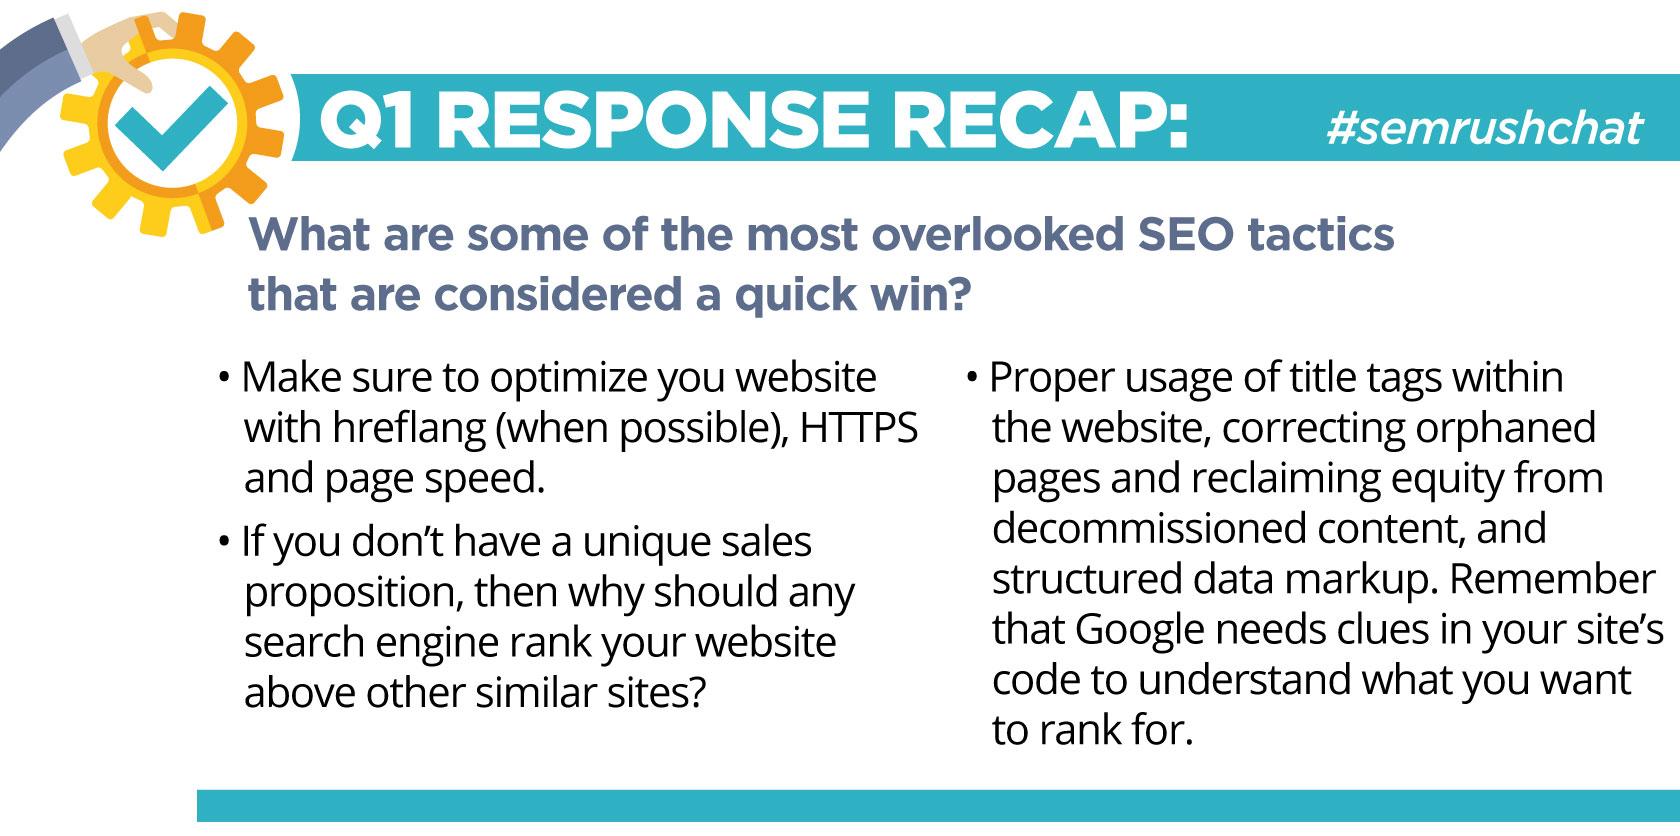 Q1 Response Recap